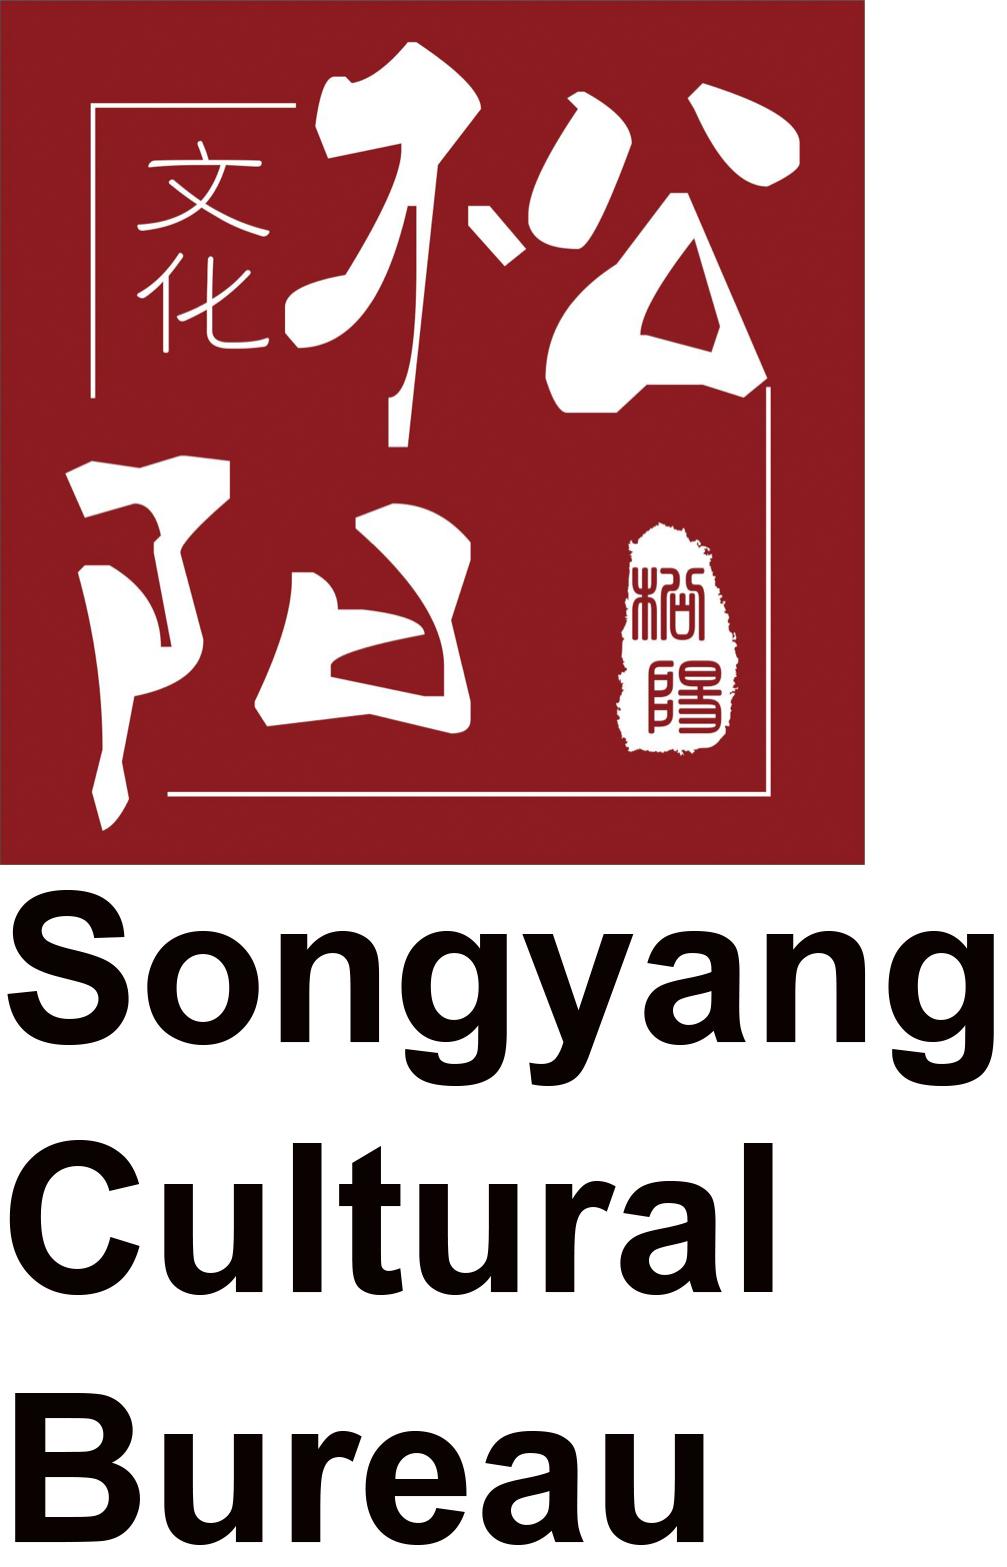 Songyang Cultural Bureau